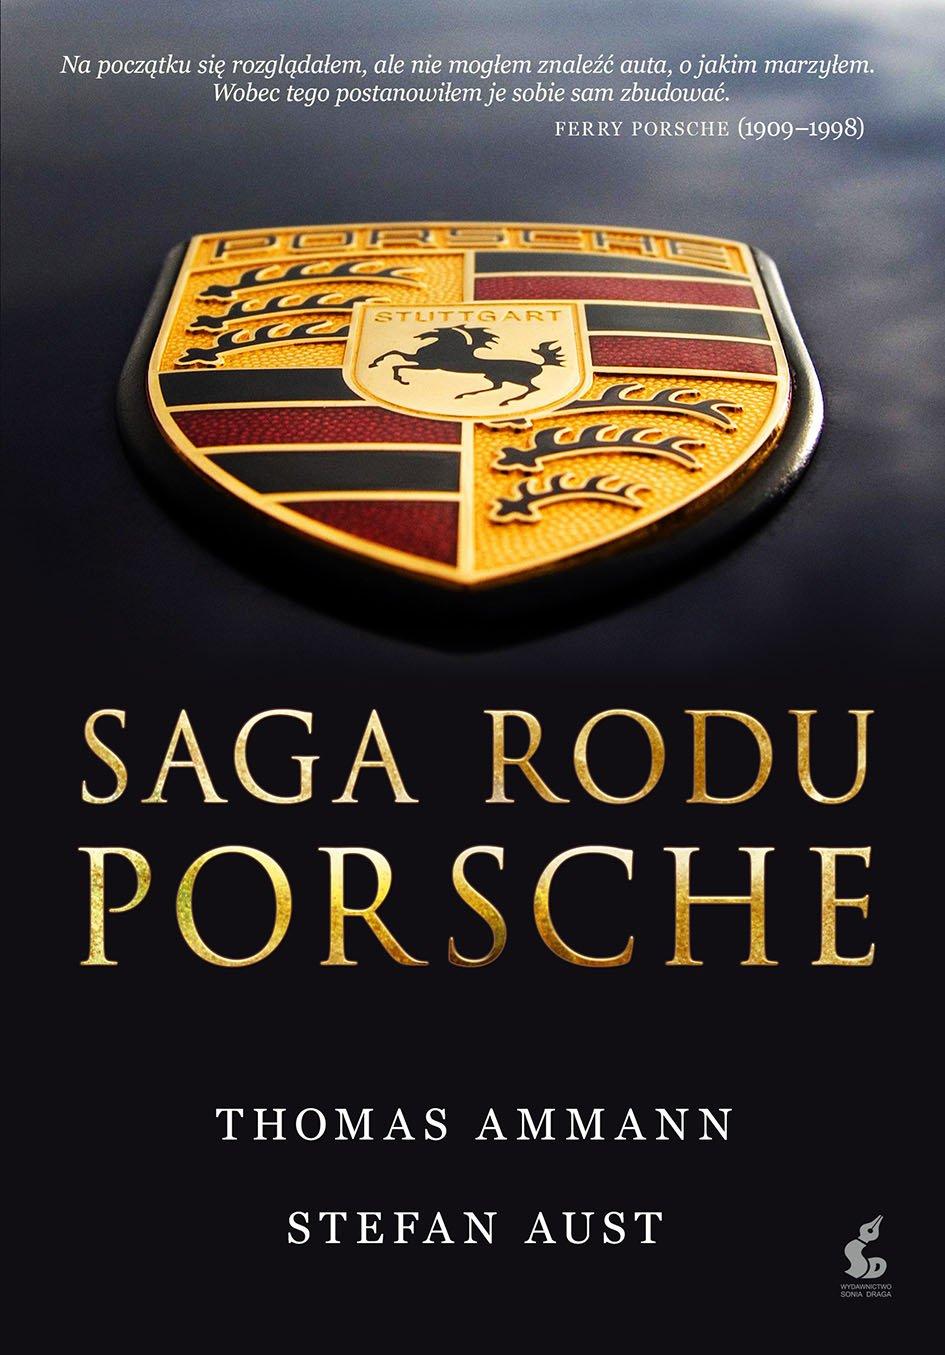 Saga rodu Porsche - Ebook (Książka na Kindle) do pobrania w formacie MOBI